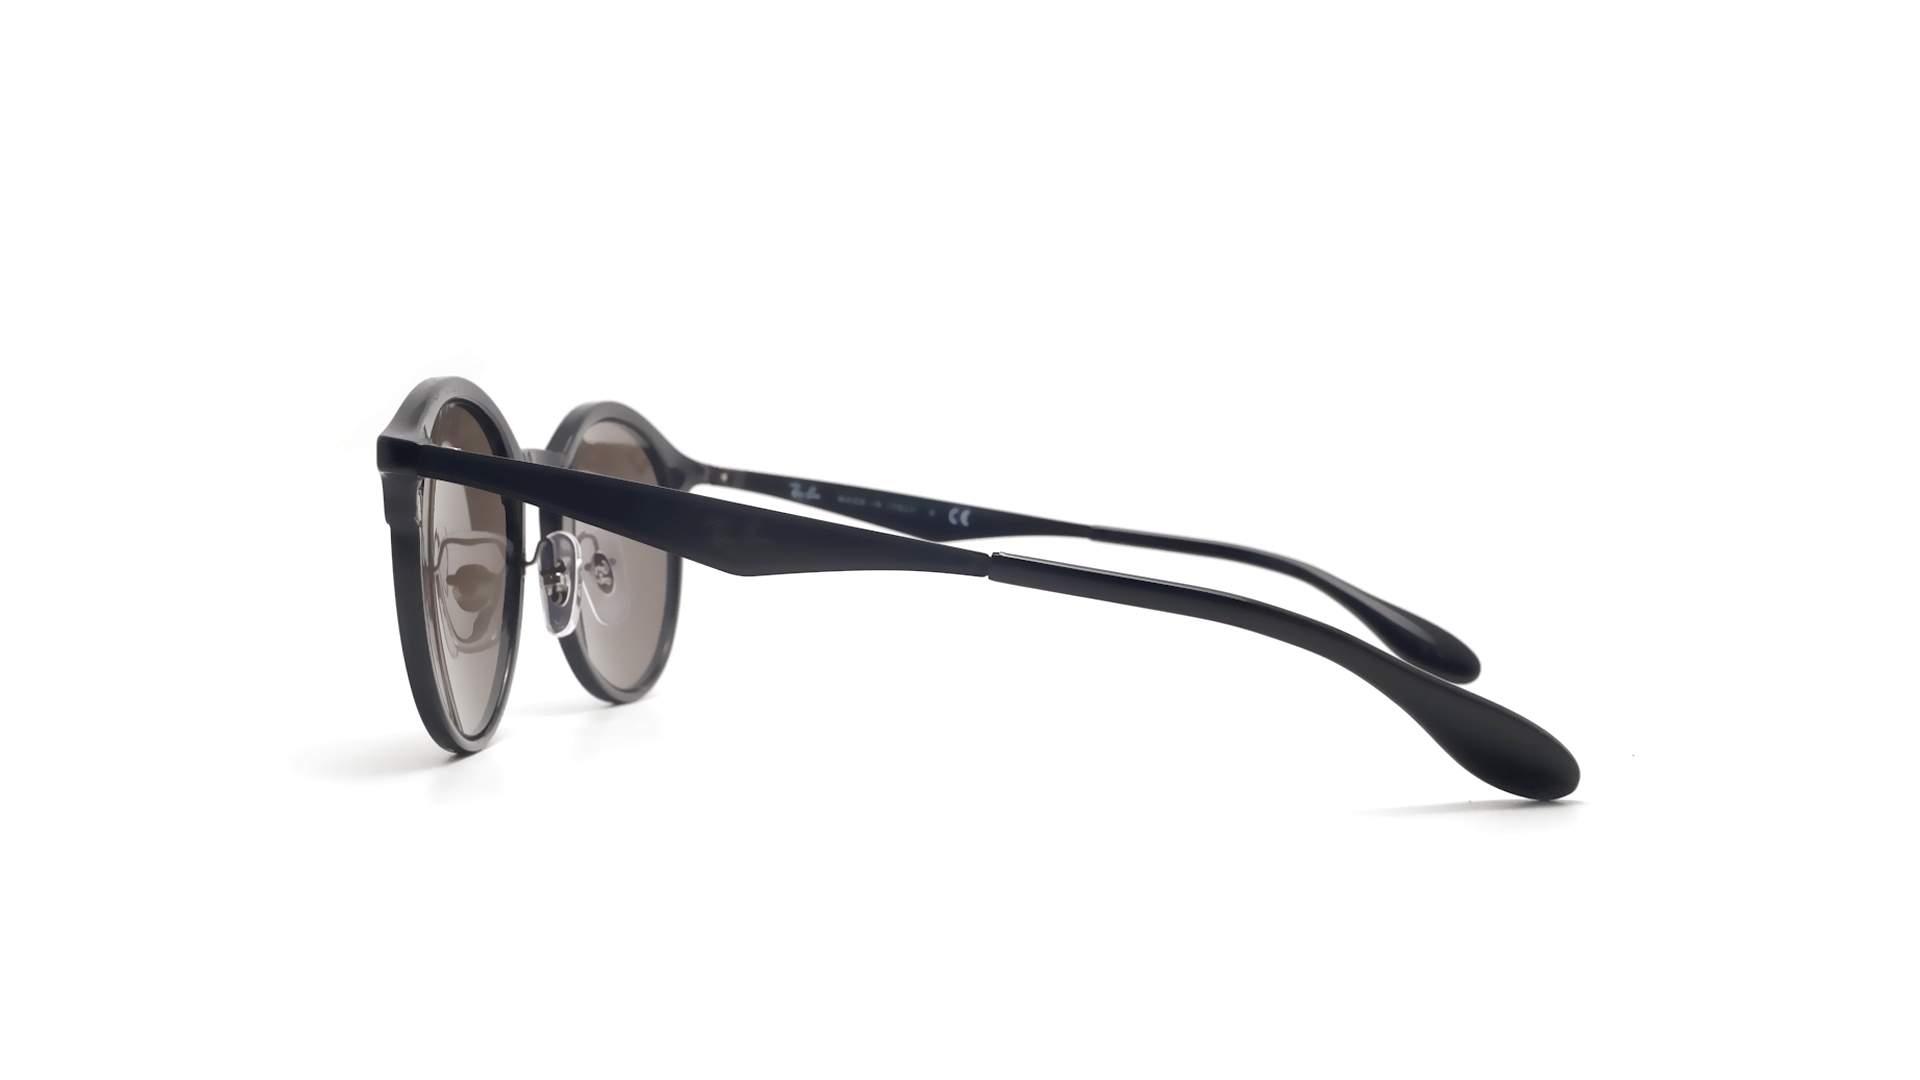 9cc6fa0a64 Sunglasses Ray-Ban Emma Black RB4277 601 5A 51-21 Medium Mirror